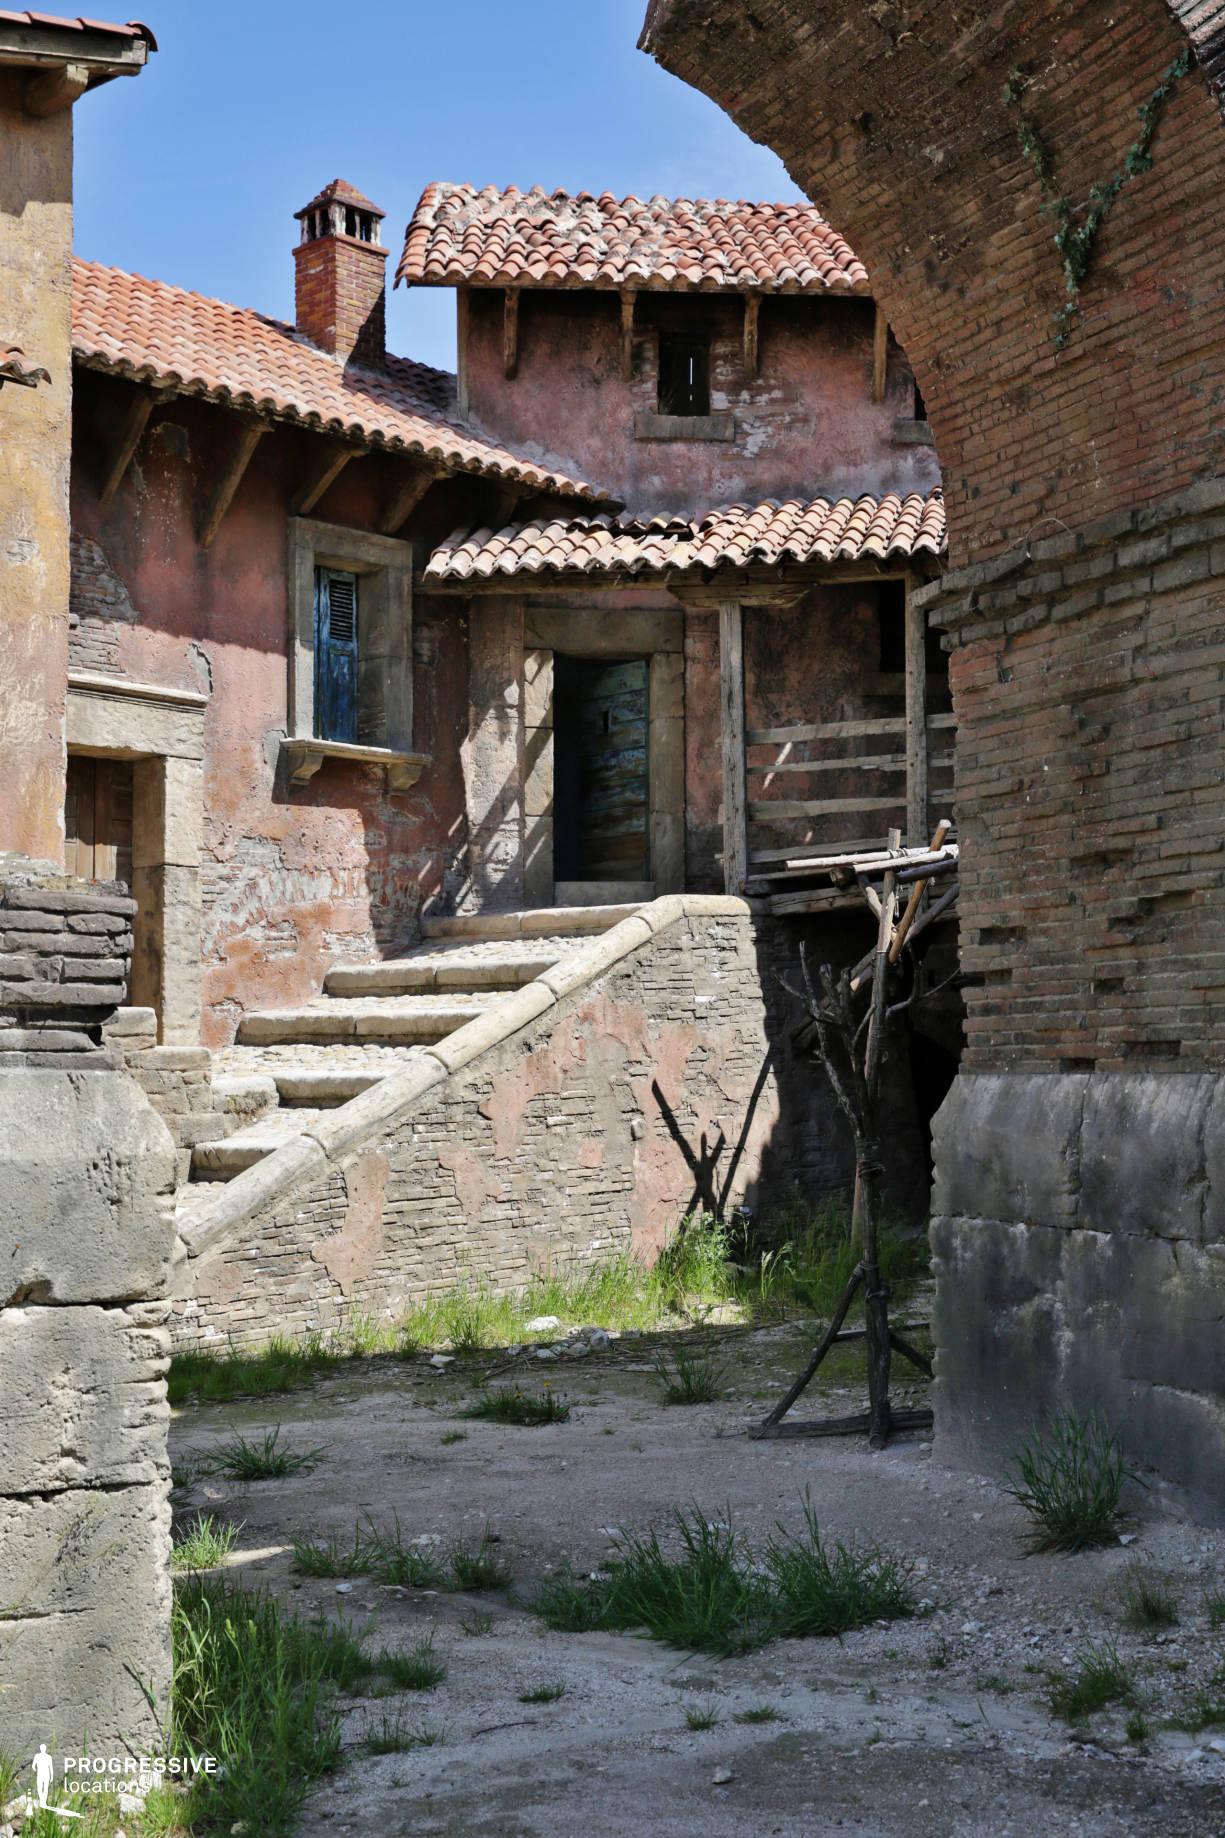 Renaissance City Backlot: House Stairs (Detail)